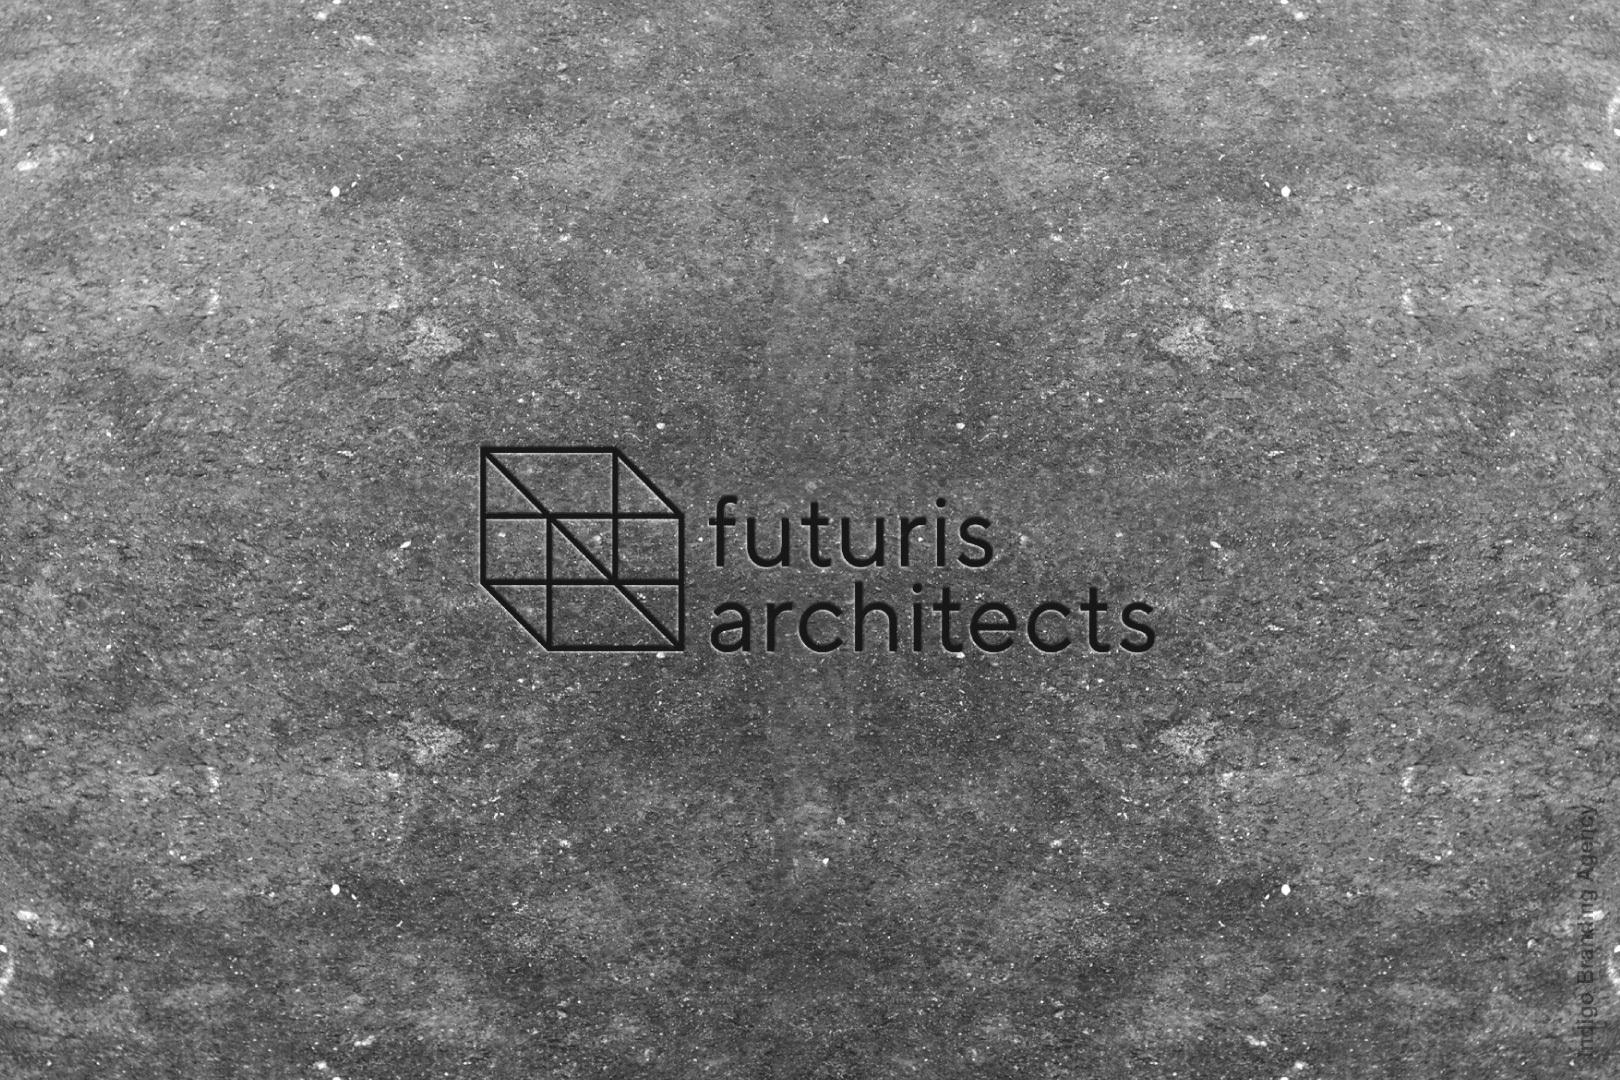 building design architectural branding mockup futuris architects interior design wall engraving